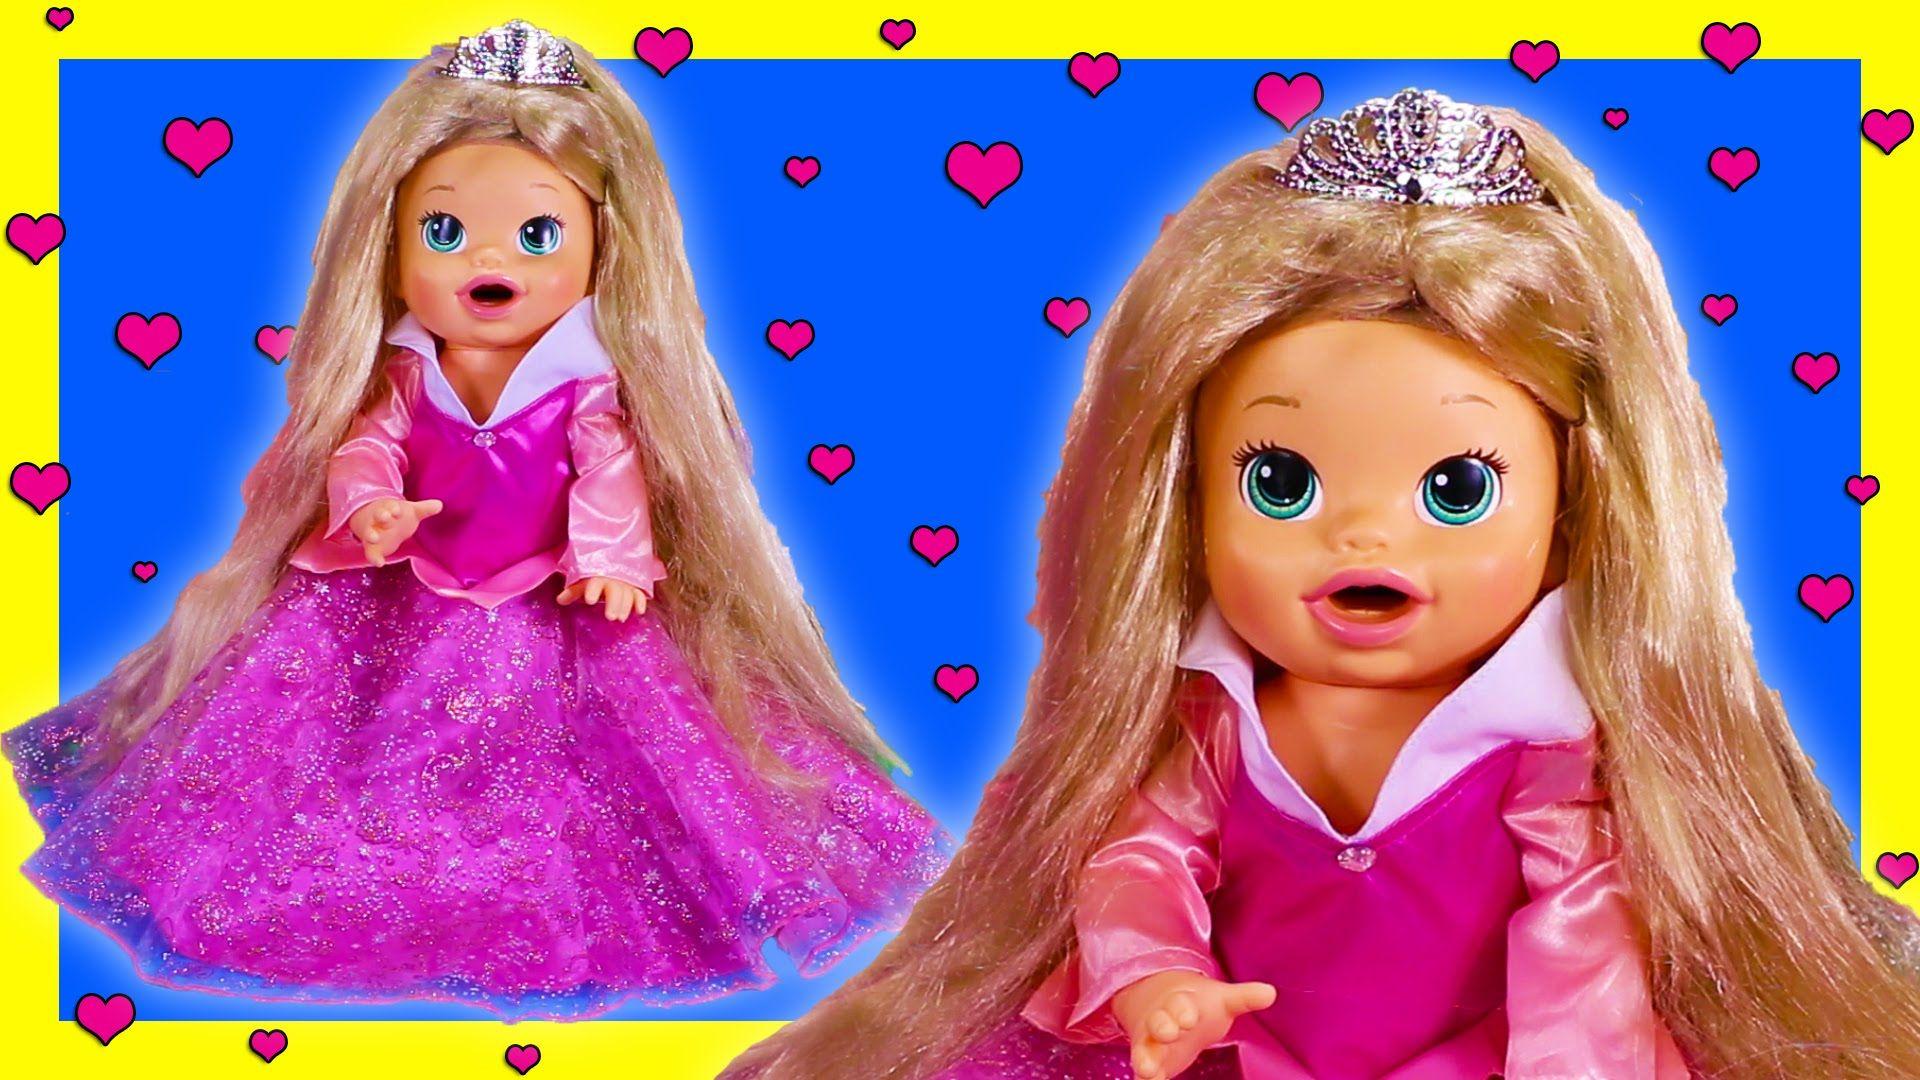 Sleeping Beauty Aurora Custom Baby Alive Doll Eats Play Doh Poops Blind Bags Baby Alive Baby Alive Dolls Custom Baby